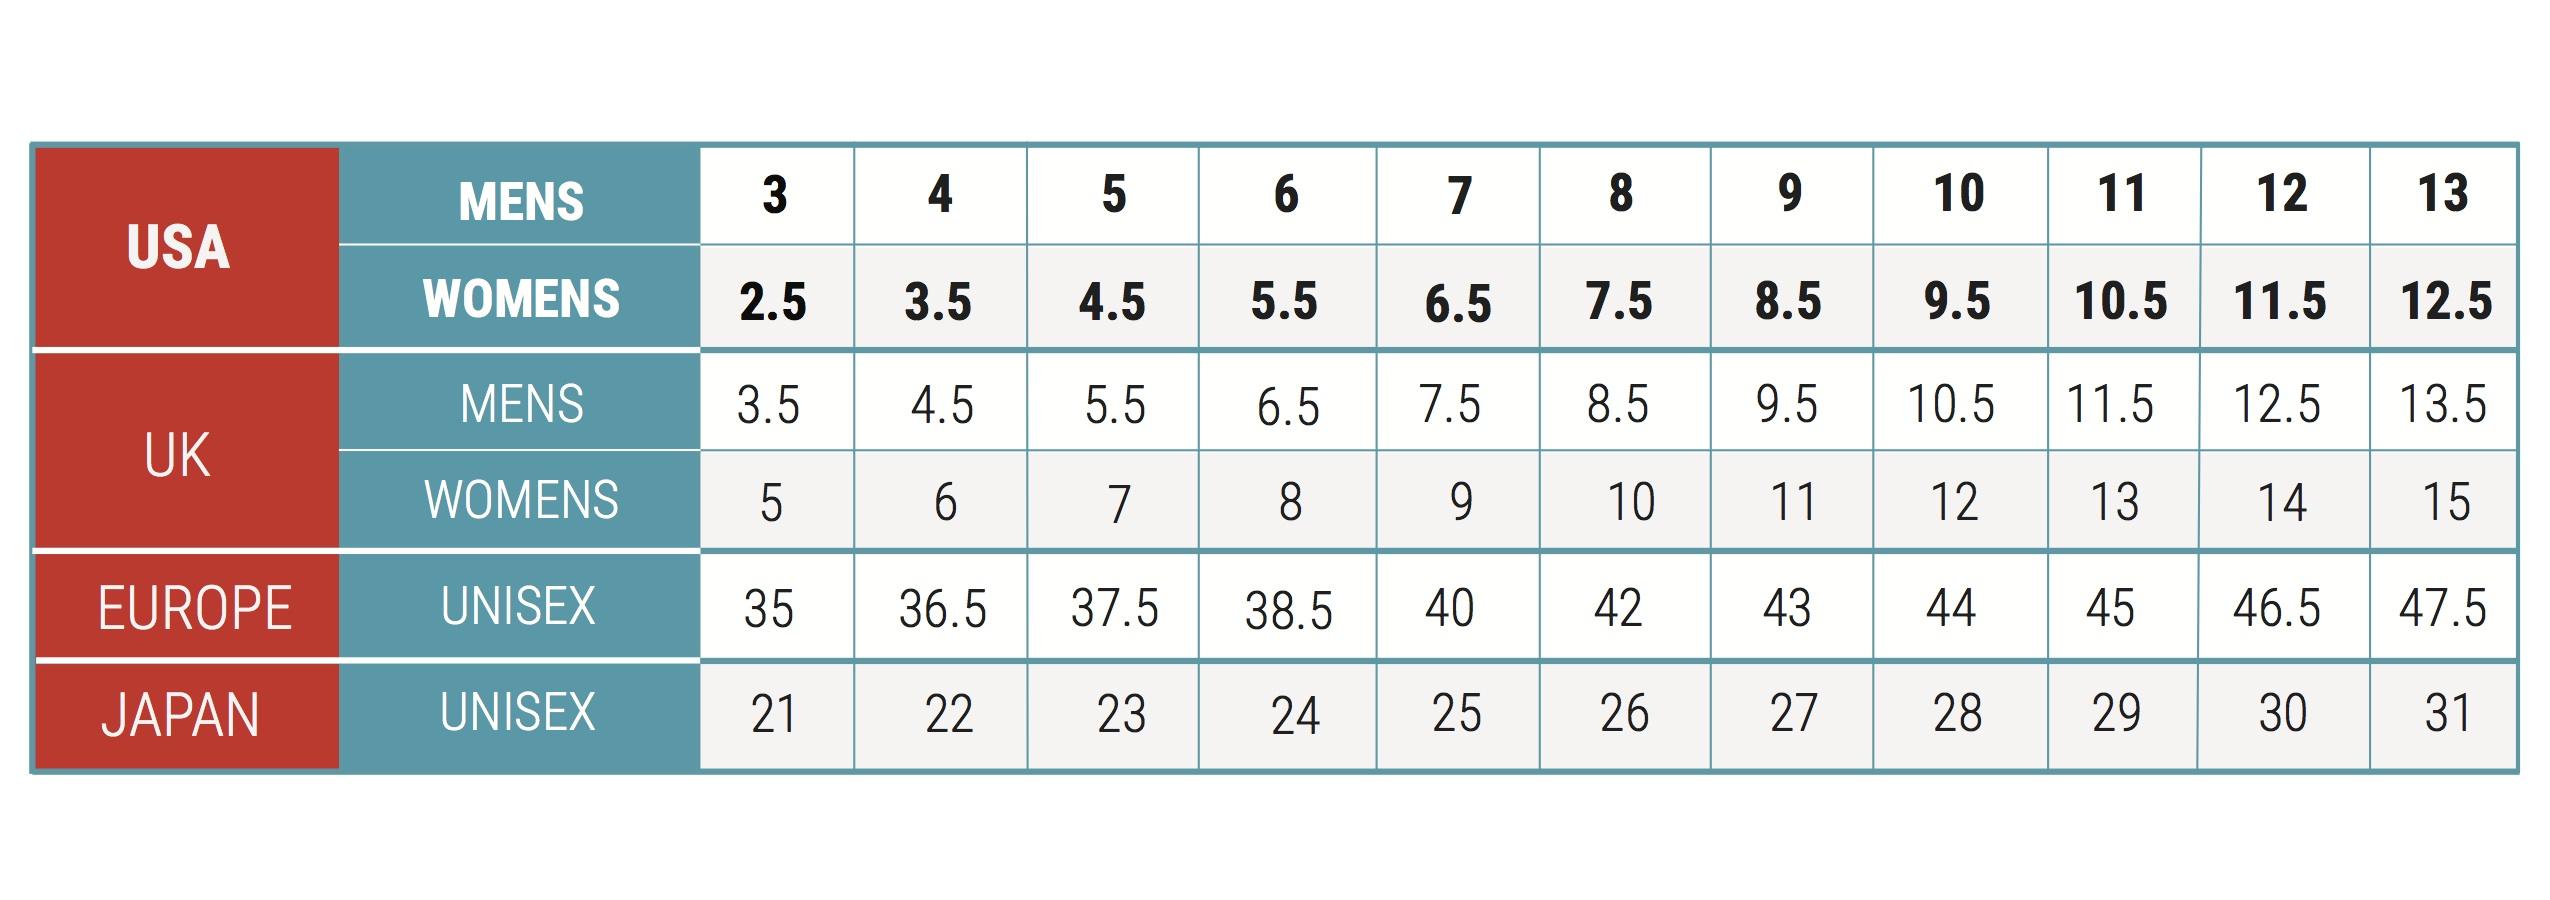 wcs-zhik-footwear-chart.jpg